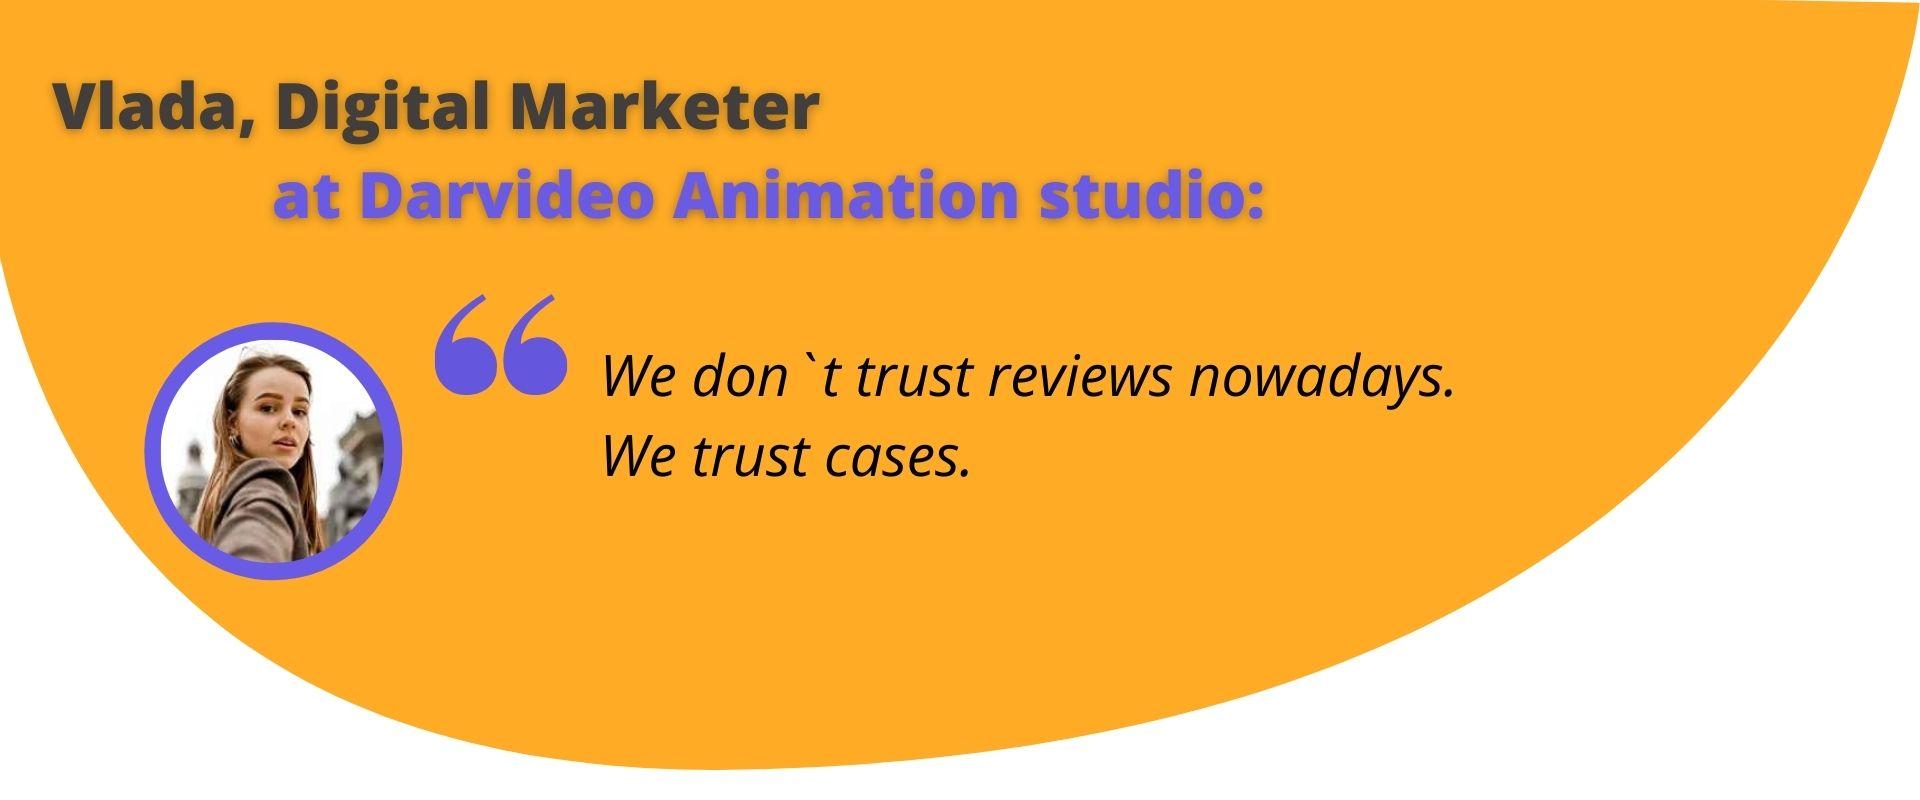 Vlada, Digital Marketer at Darvideo Animation studio - Choosing an Animated Video Company